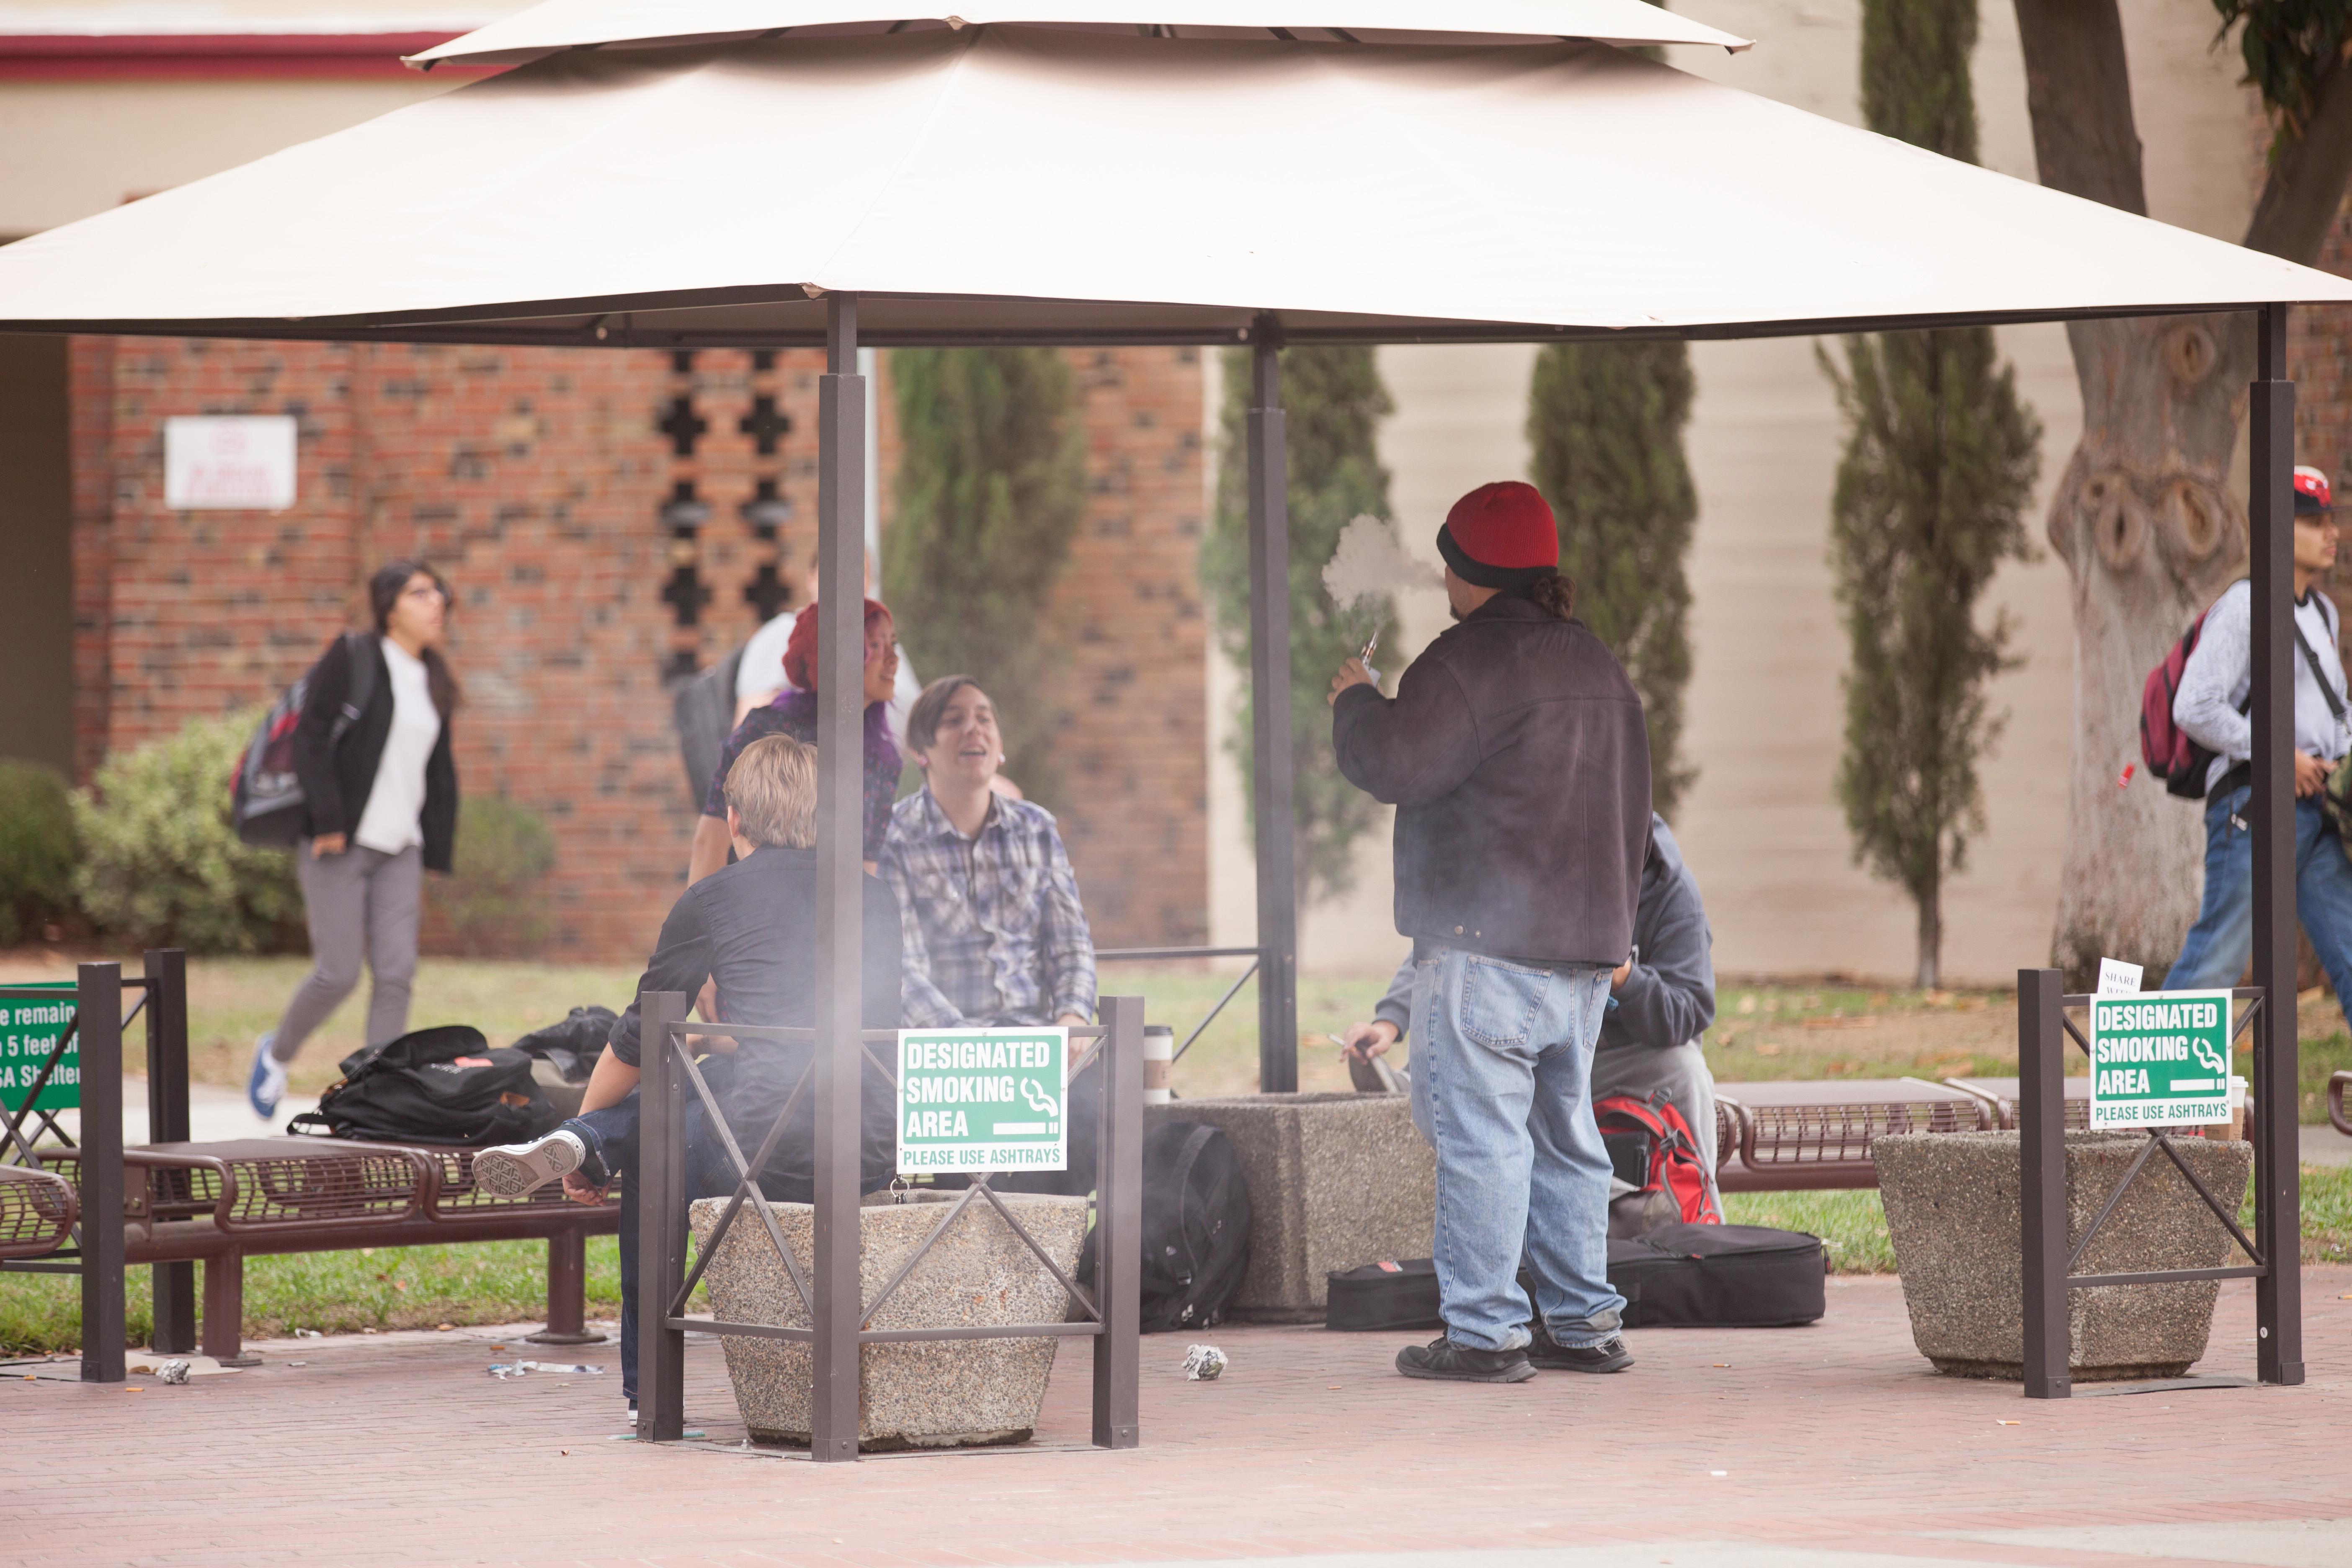 smoking on college campus